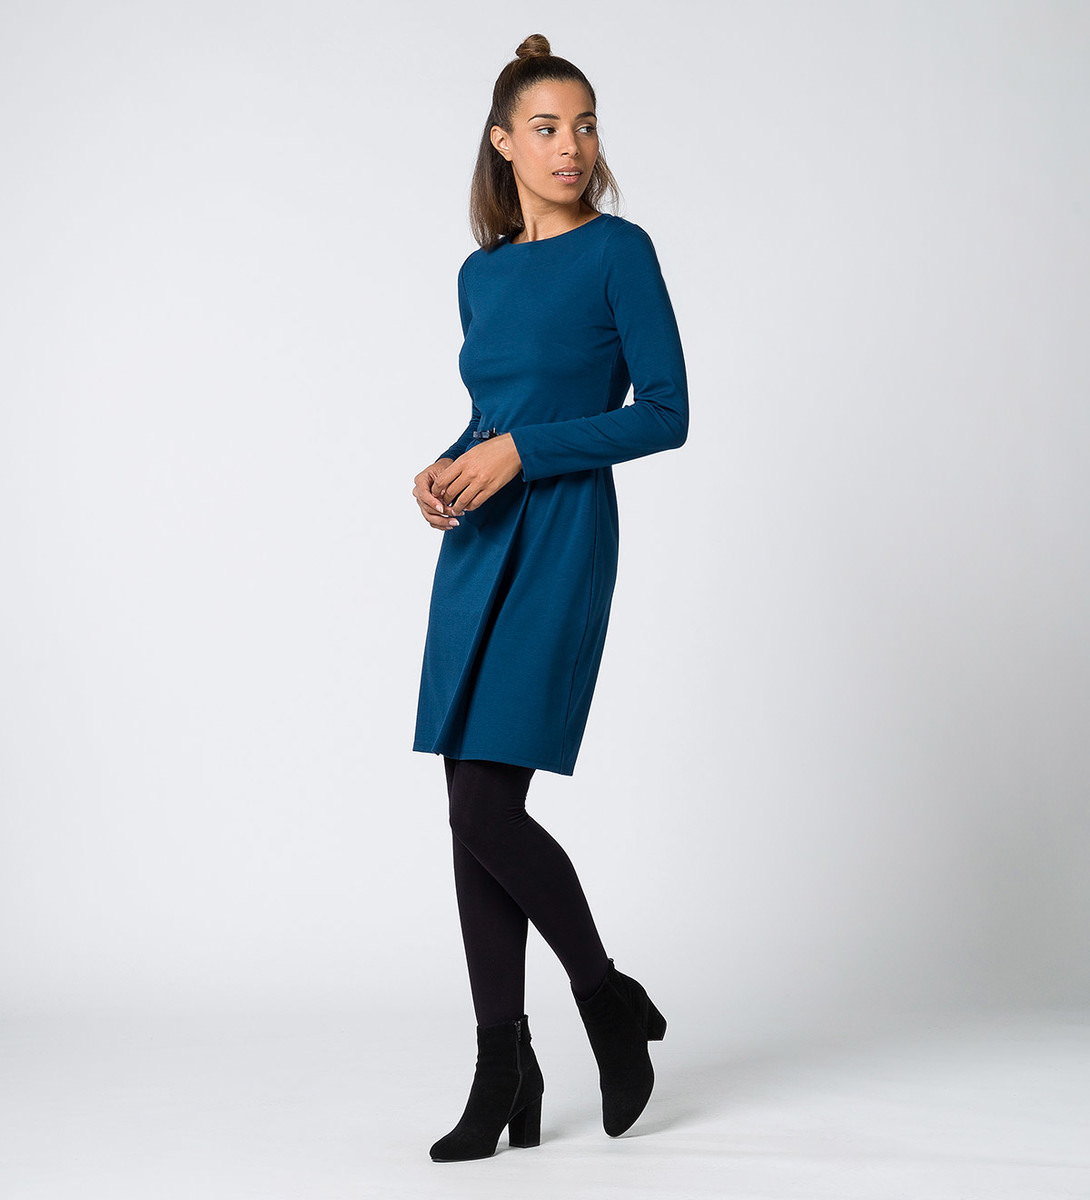 Kleid mit Gürtel in petrol blue